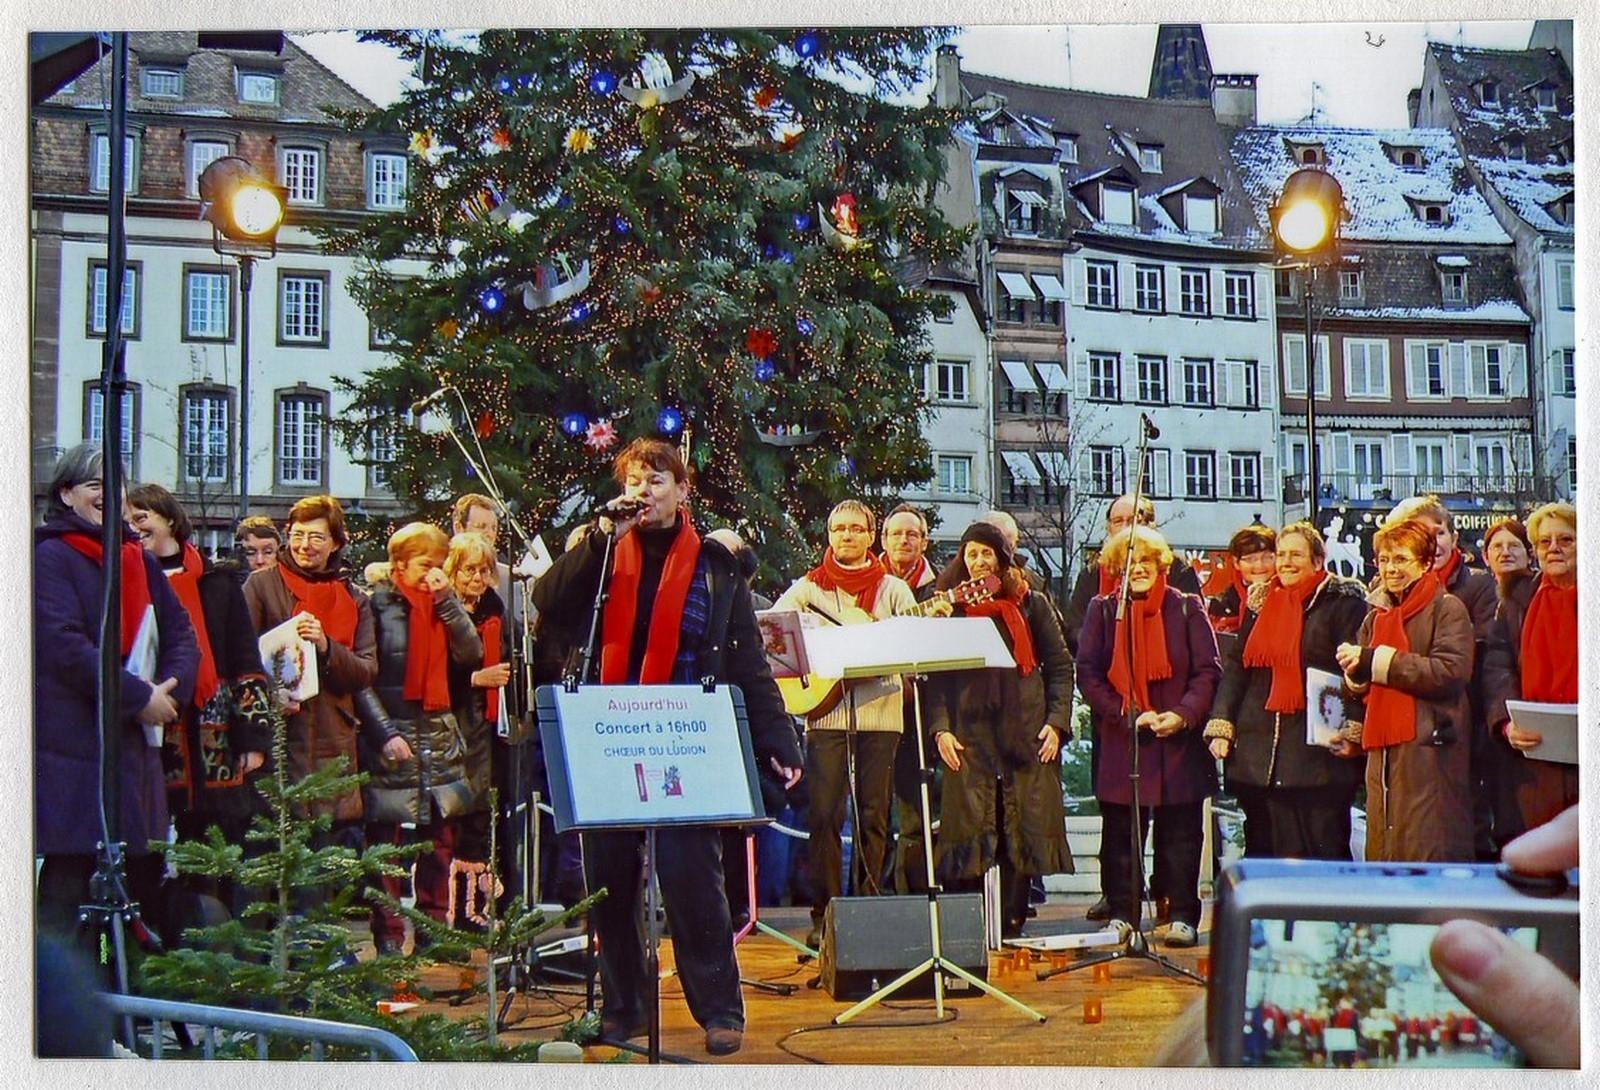 2010 - Strasbourg - Marché de Noël